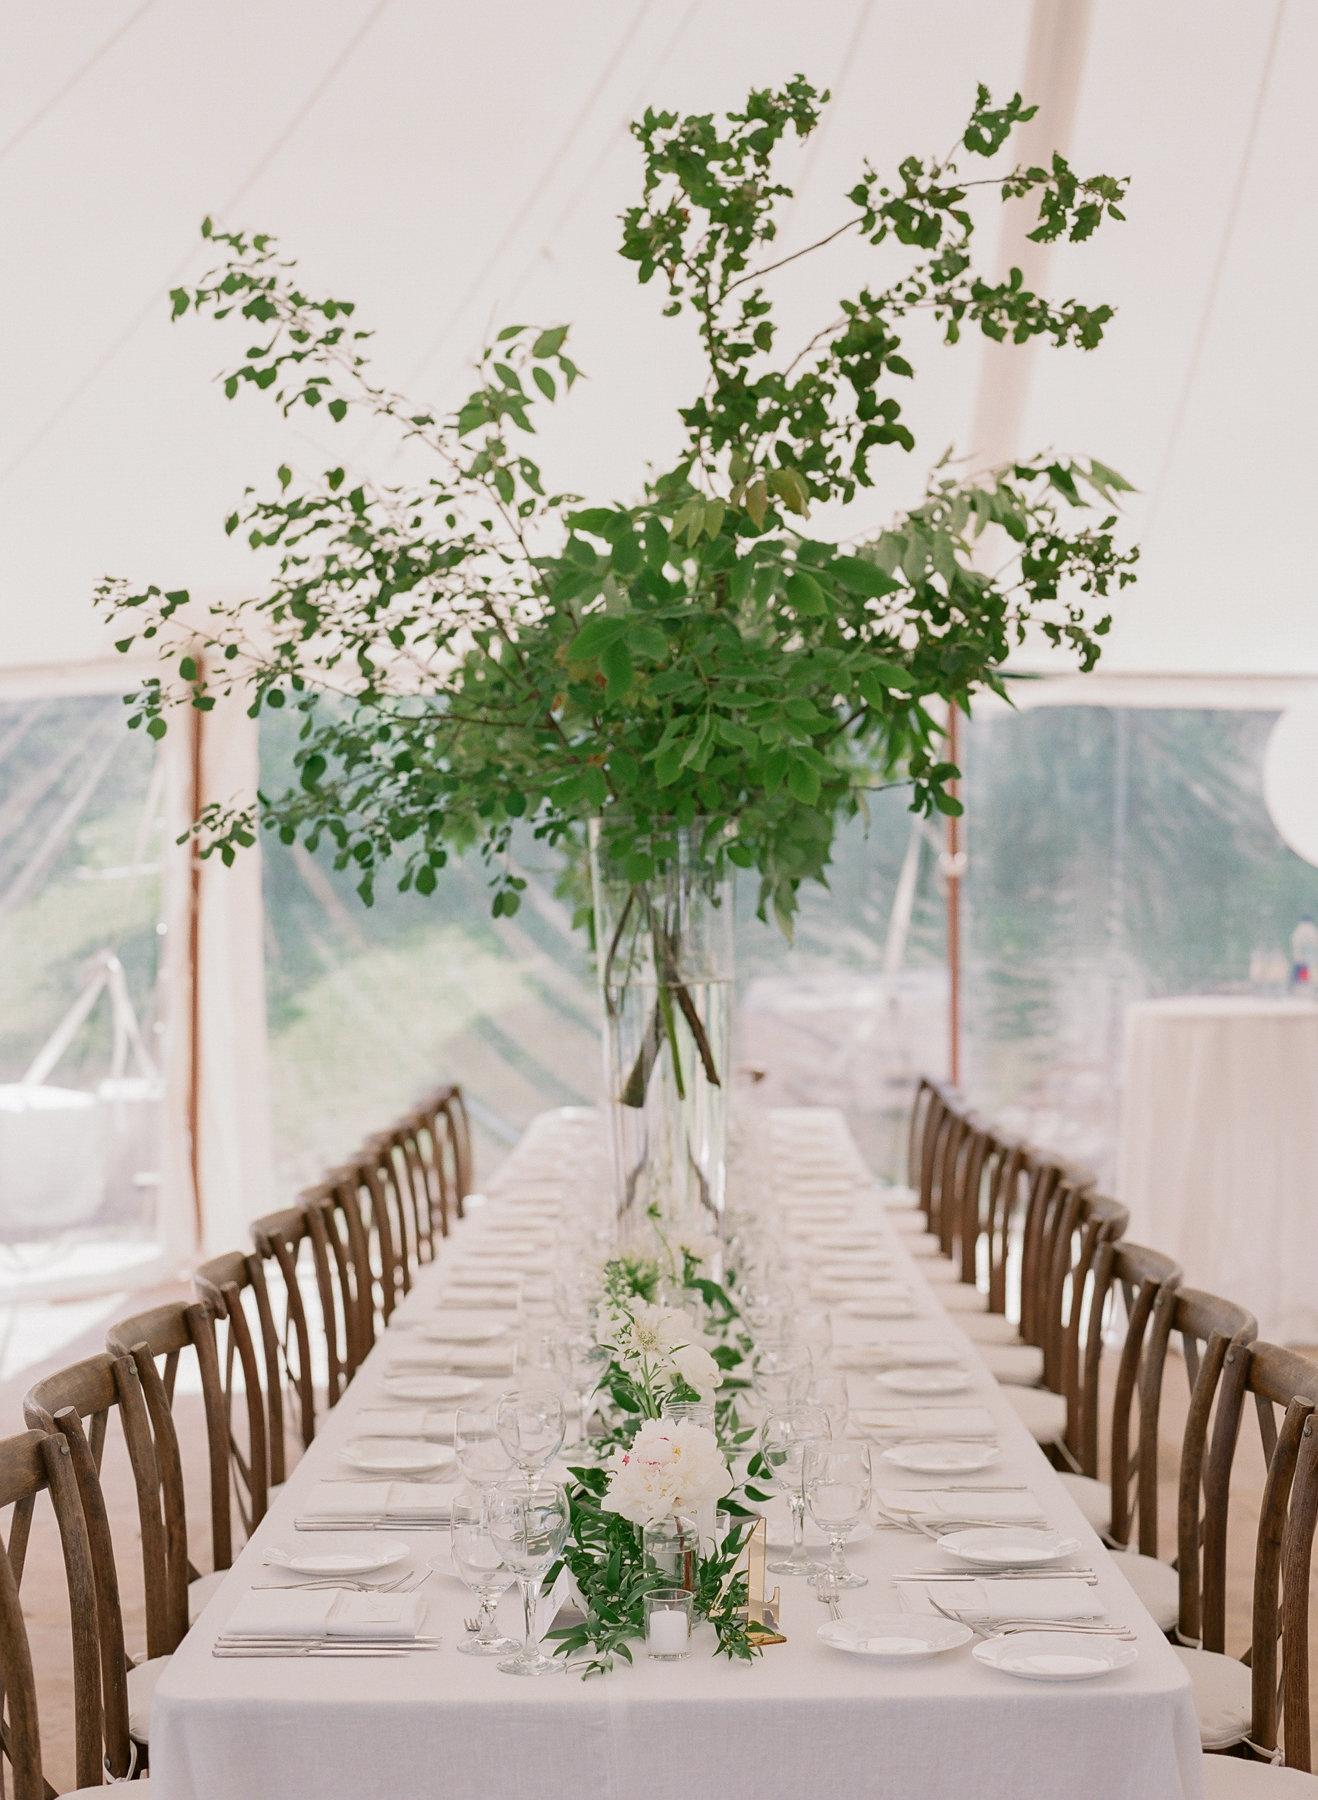 0836-maggiebrett-private-estate-wedding-000006340010.jpg